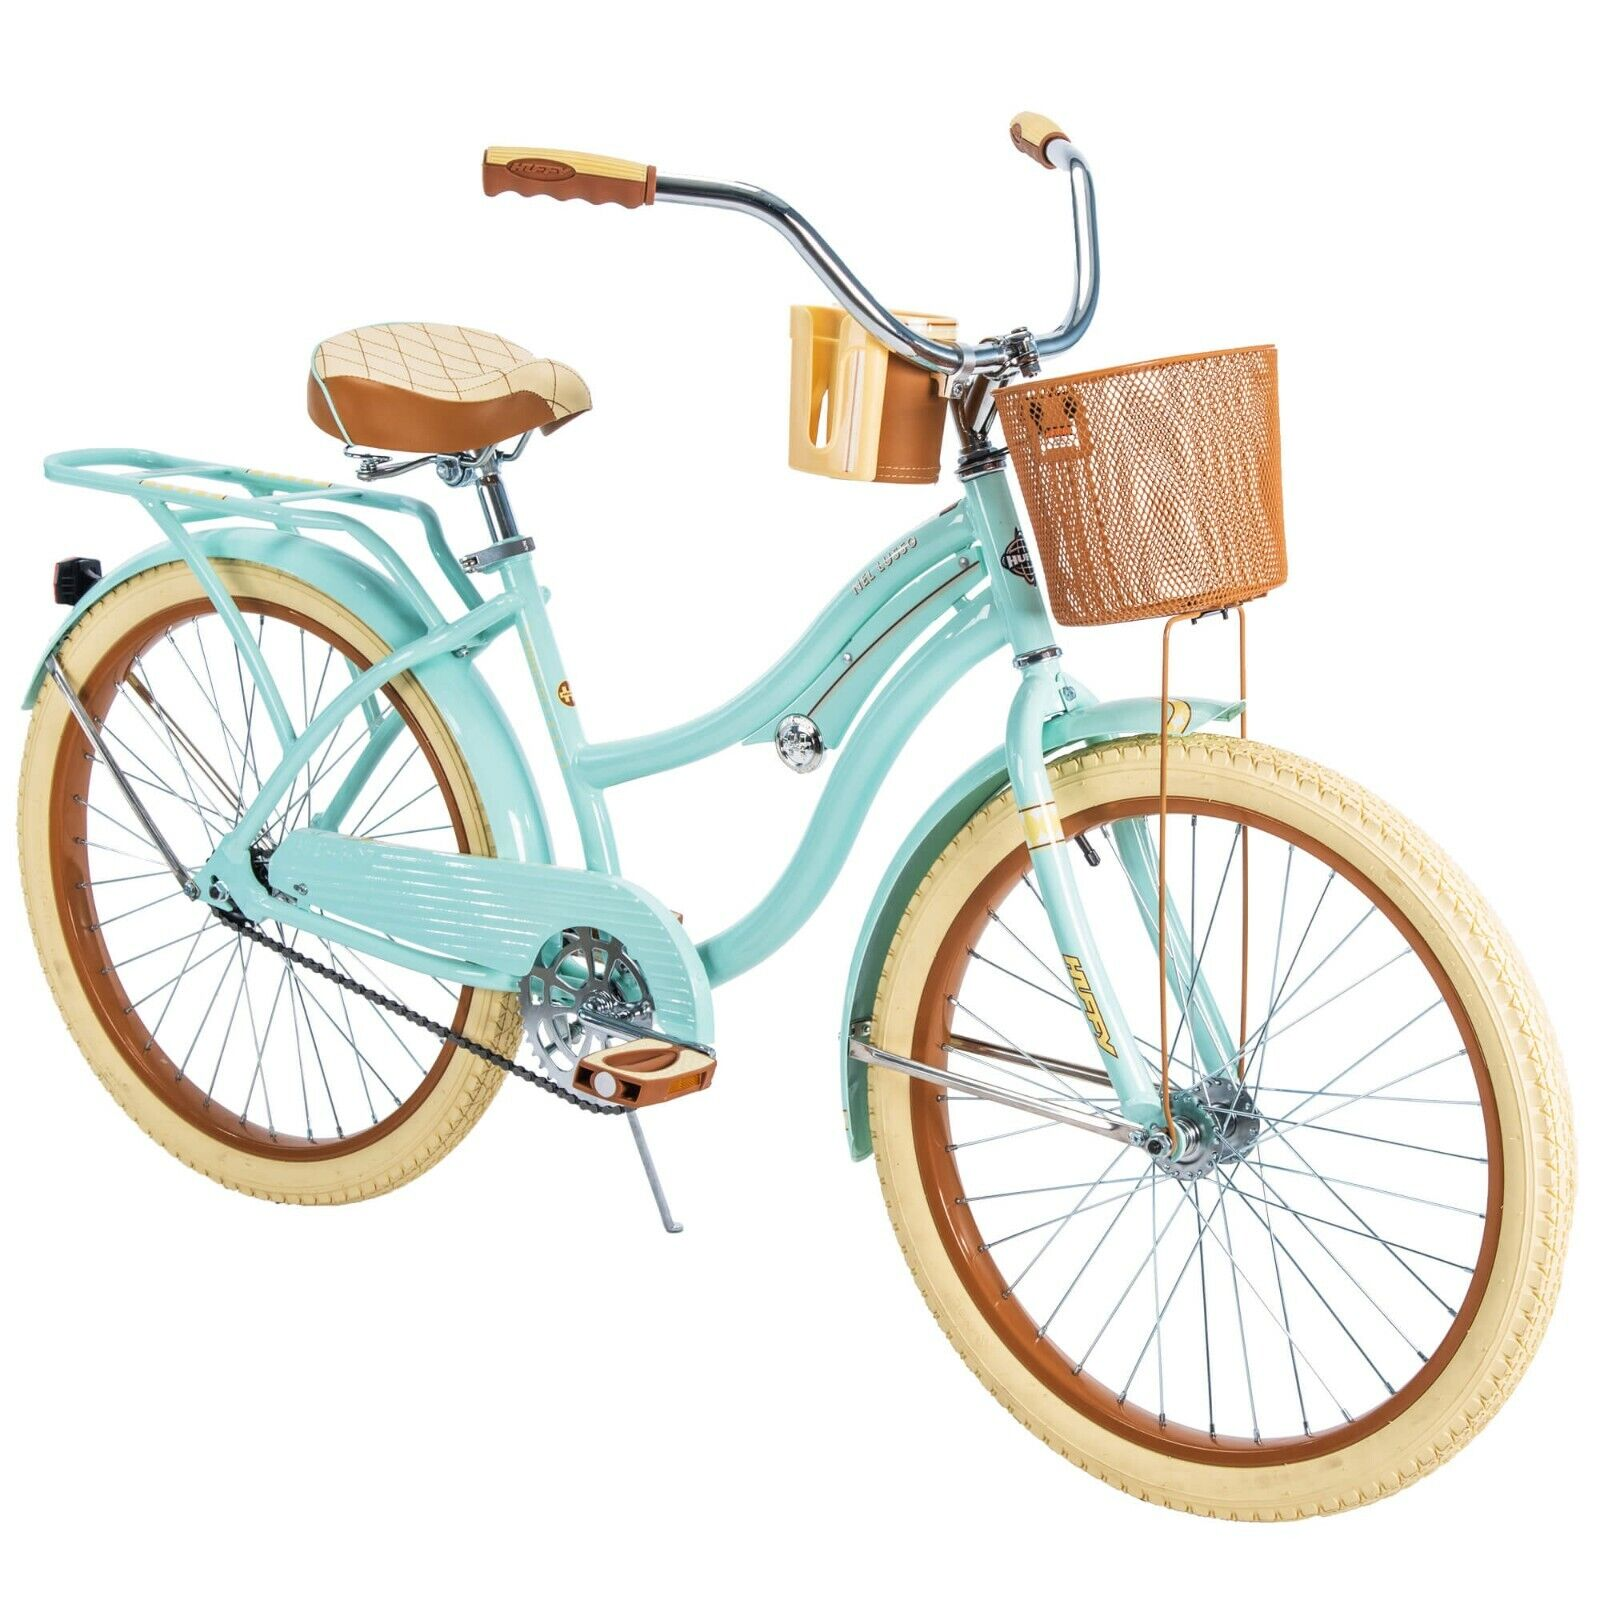 "Huffy 24"" Nel Lusso Girls Cruiser Bike - Mint Green - BRAND"